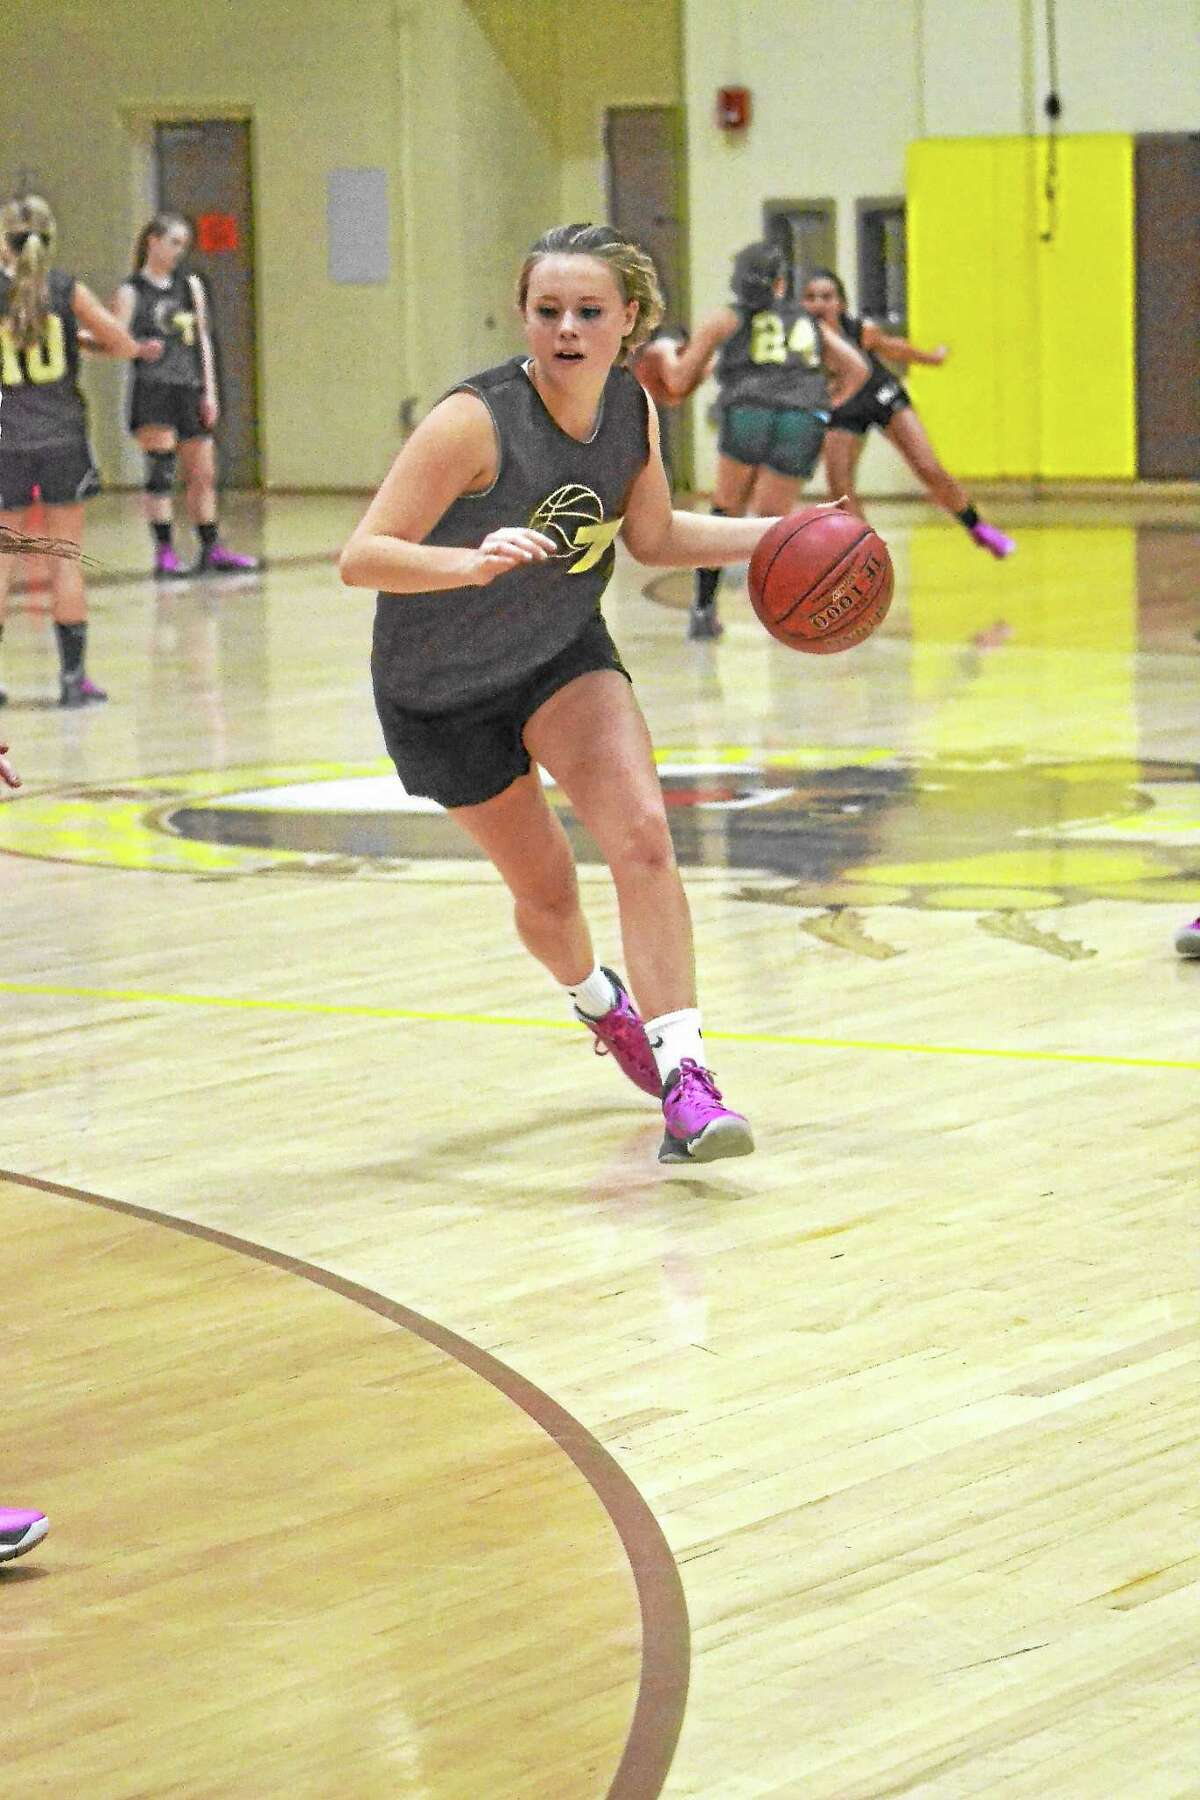 Thomaston's Abby Hurlbert was a big part of the Golden Bears success last season as a junior. This season Hurlbert hopes to lead Thomaston back to Berkshire League title.